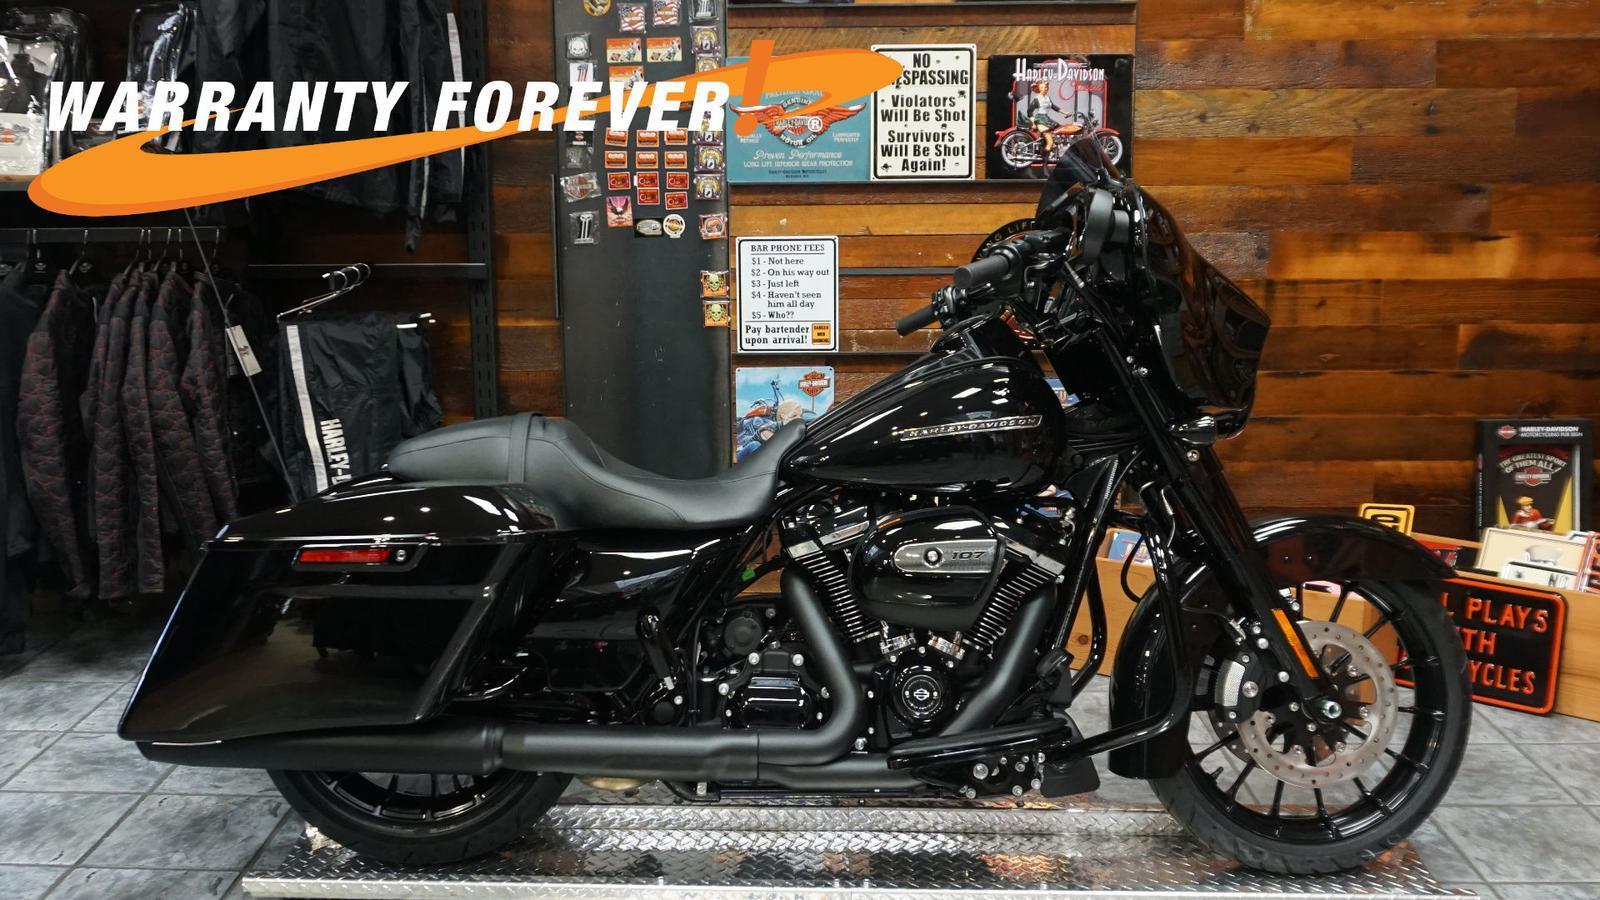 Harley Davidson Street Glide Wallpapers Top Free Harley